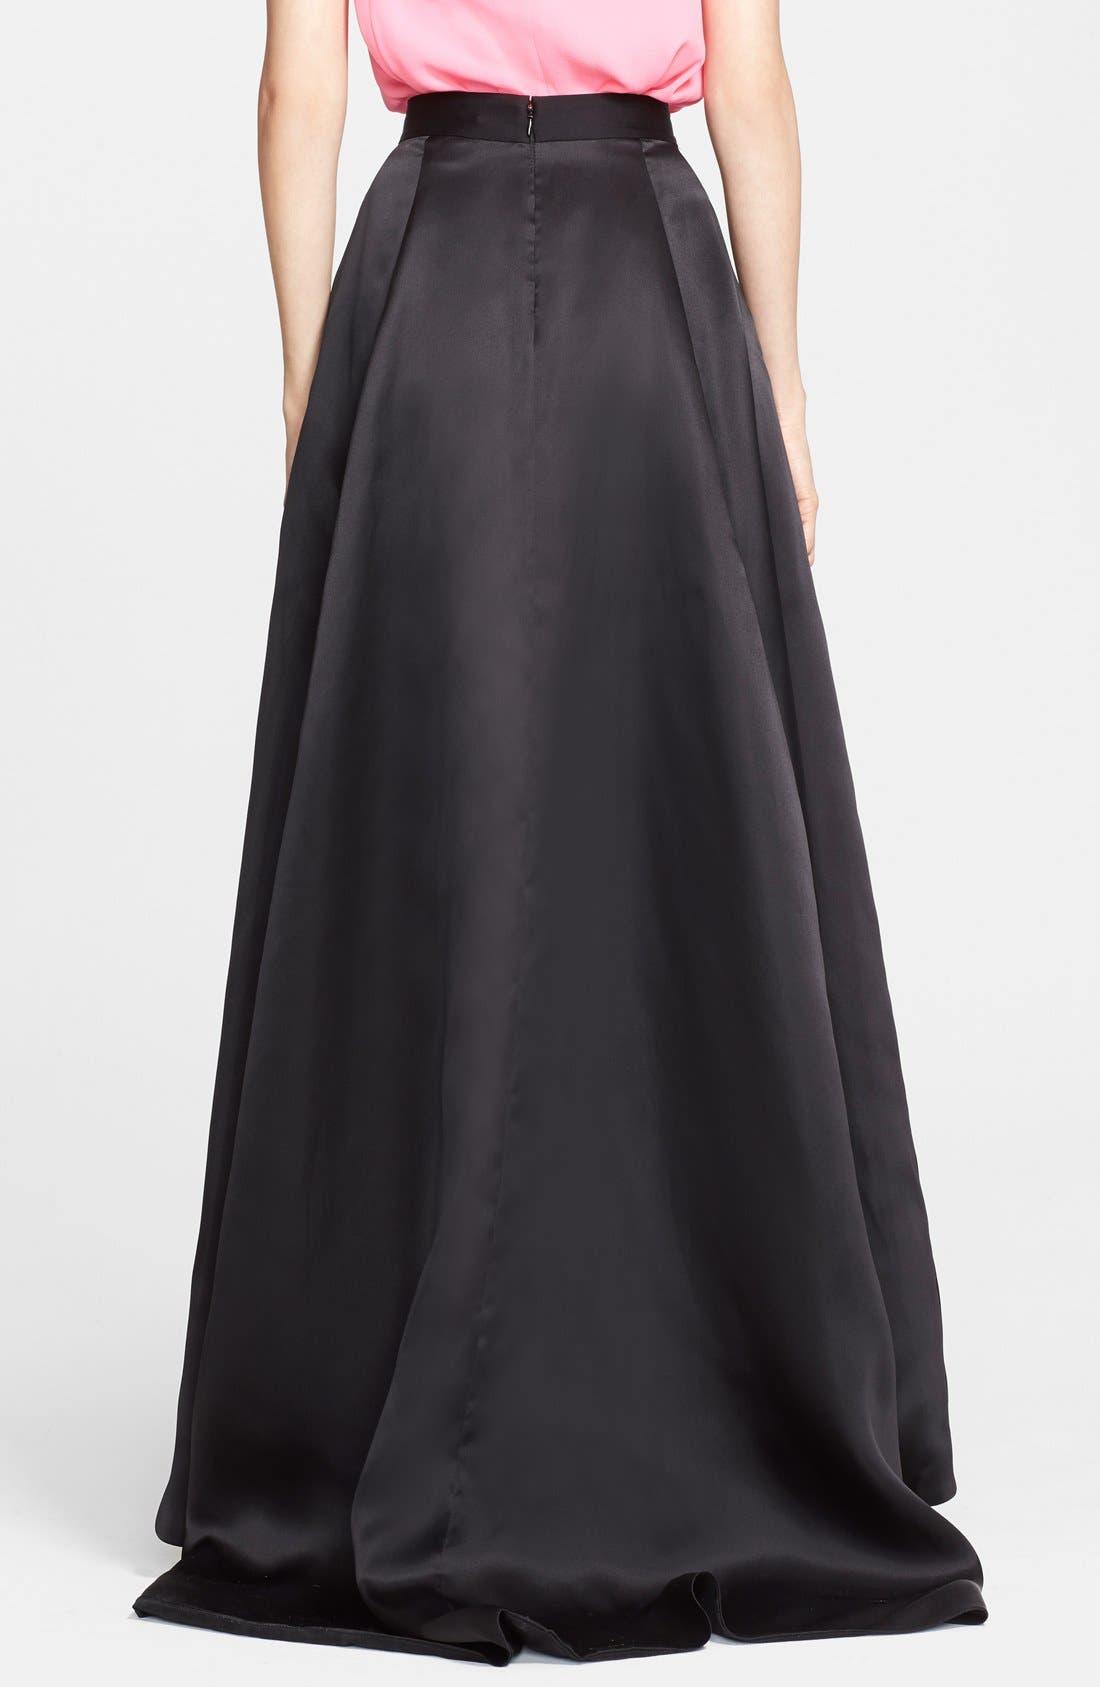 ST. JOHN COLLECTION,                             Satin Face Silk Organza Ballgown Skirt,                             Alternate thumbnail 3, color,                             001